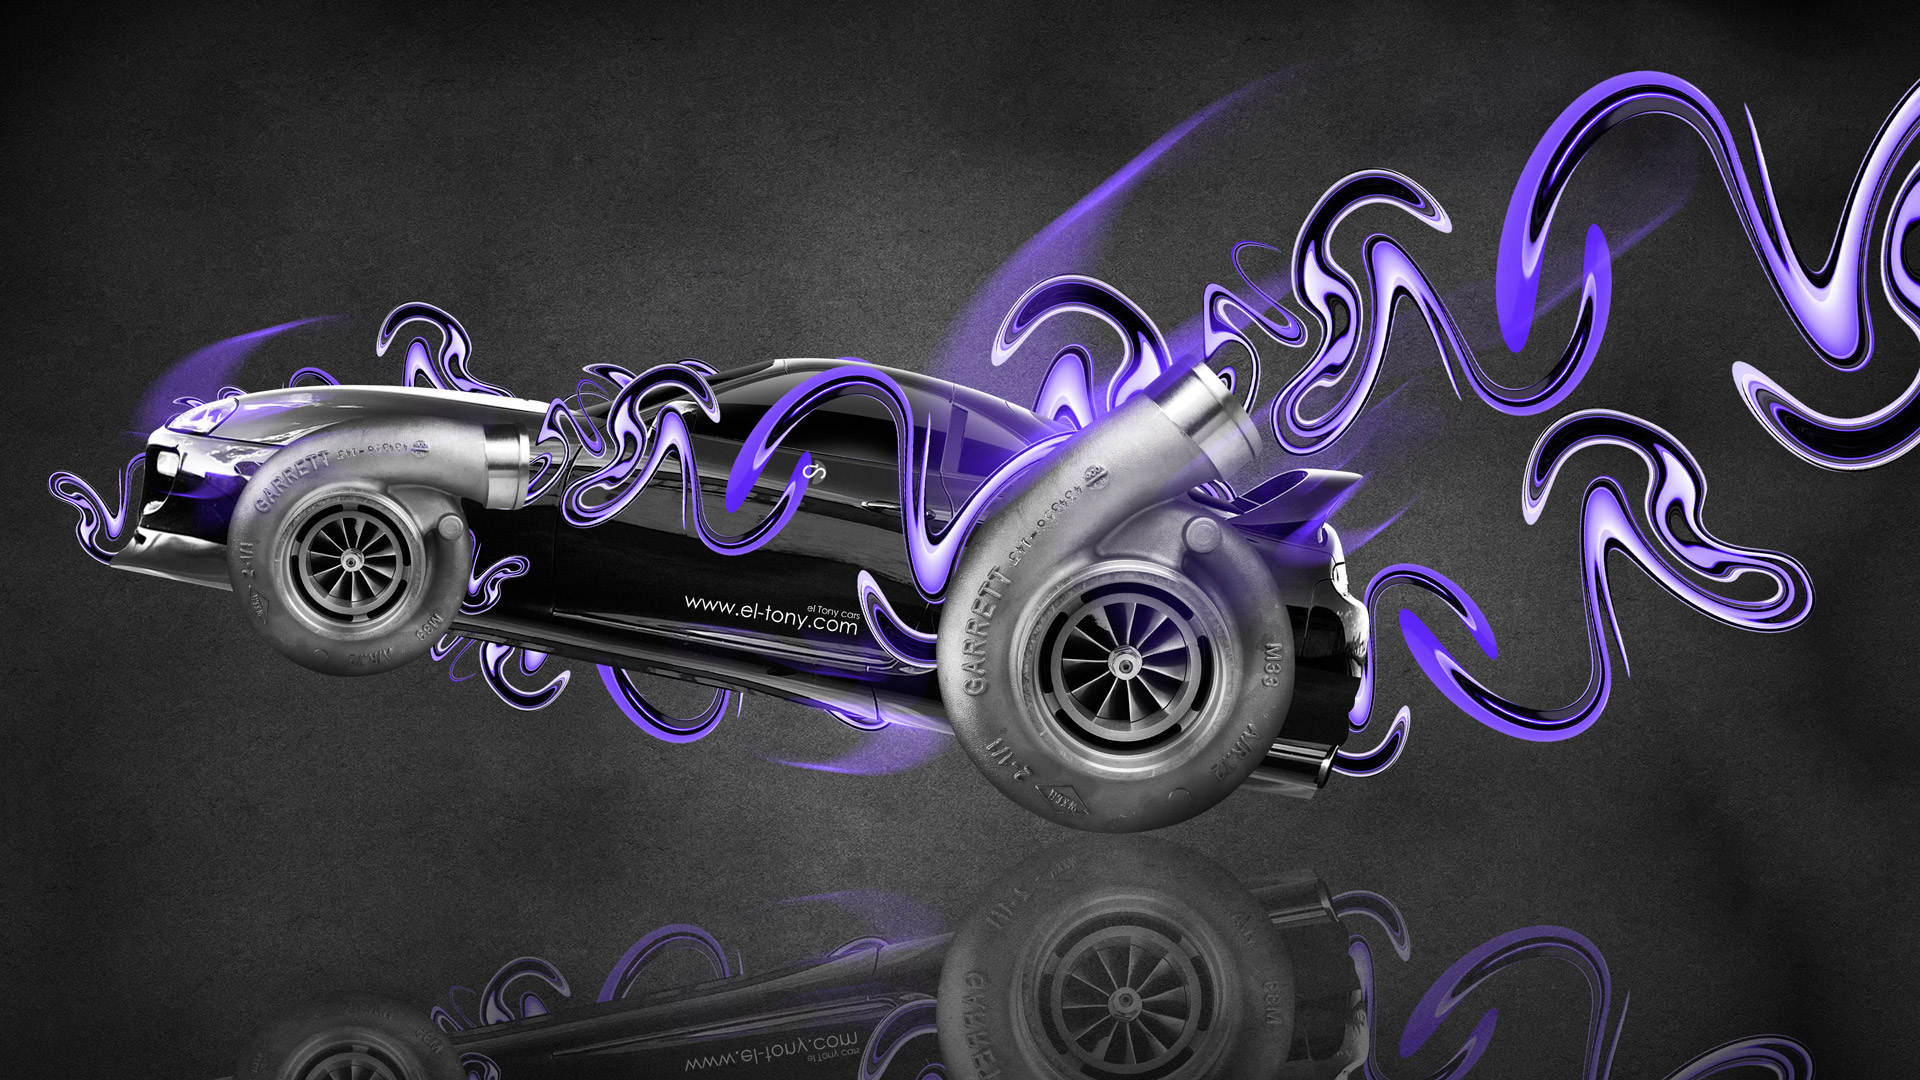 Best 49 Turbocharger Wallpaper on HipWallpaper Turbocharger 1920x1080